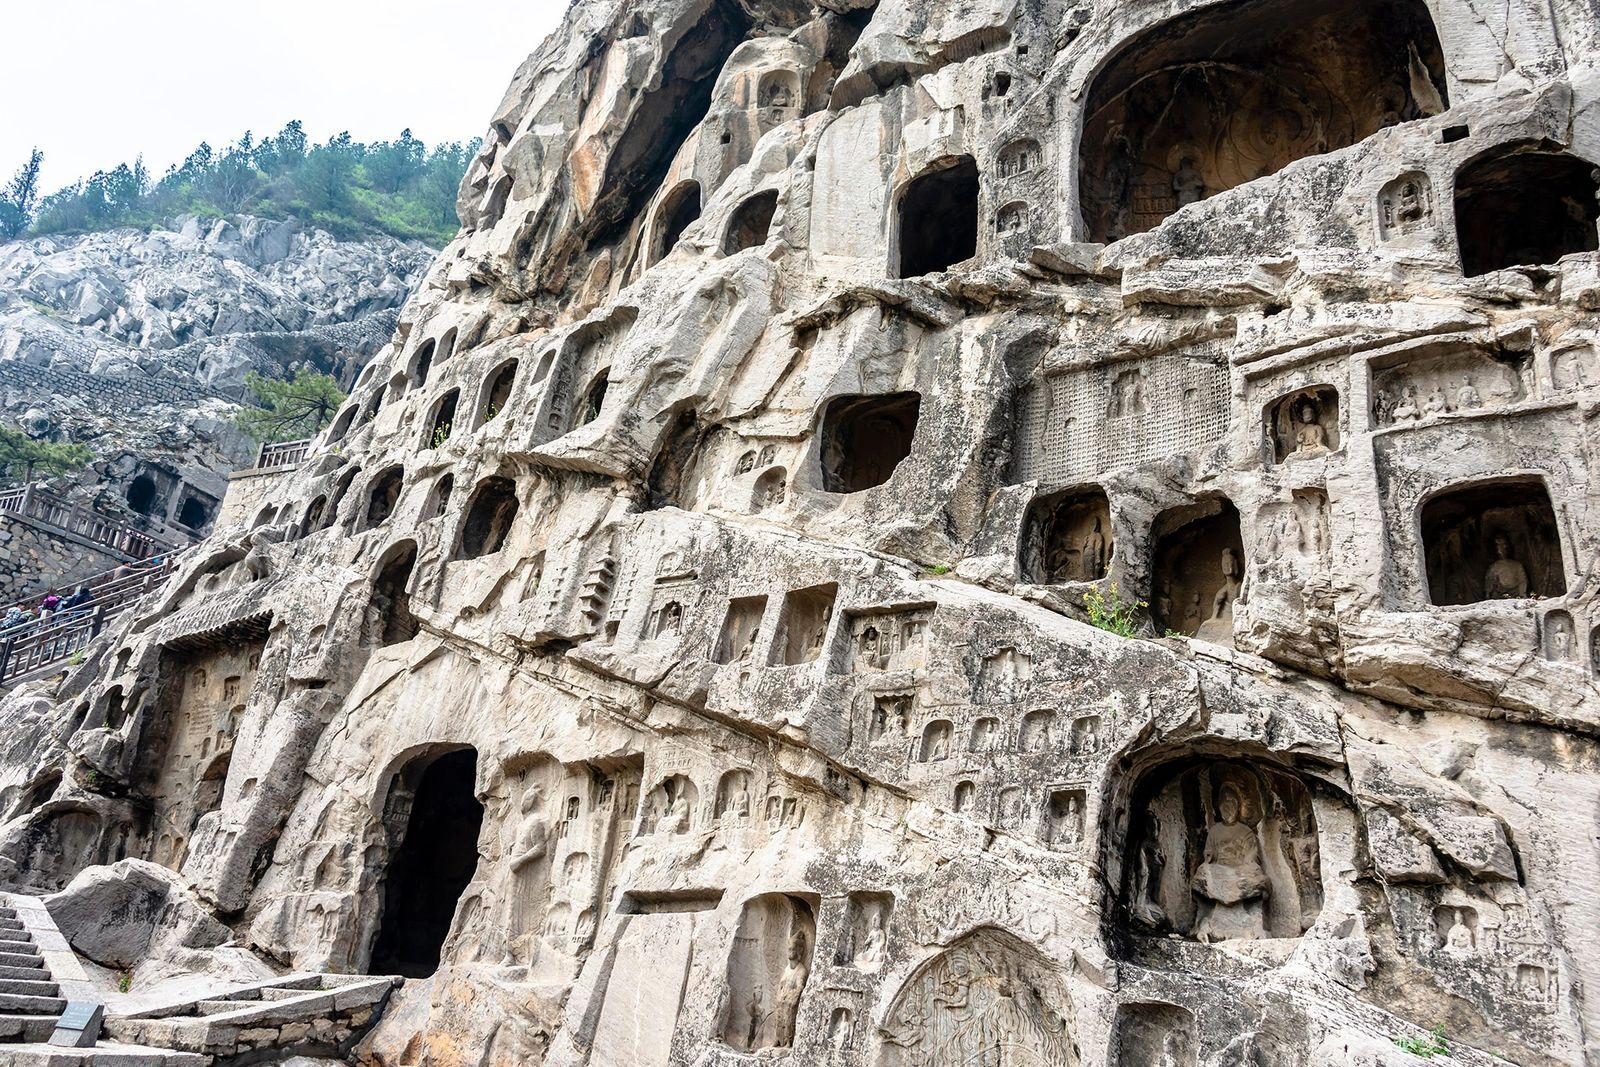 Las grutas de Longmen